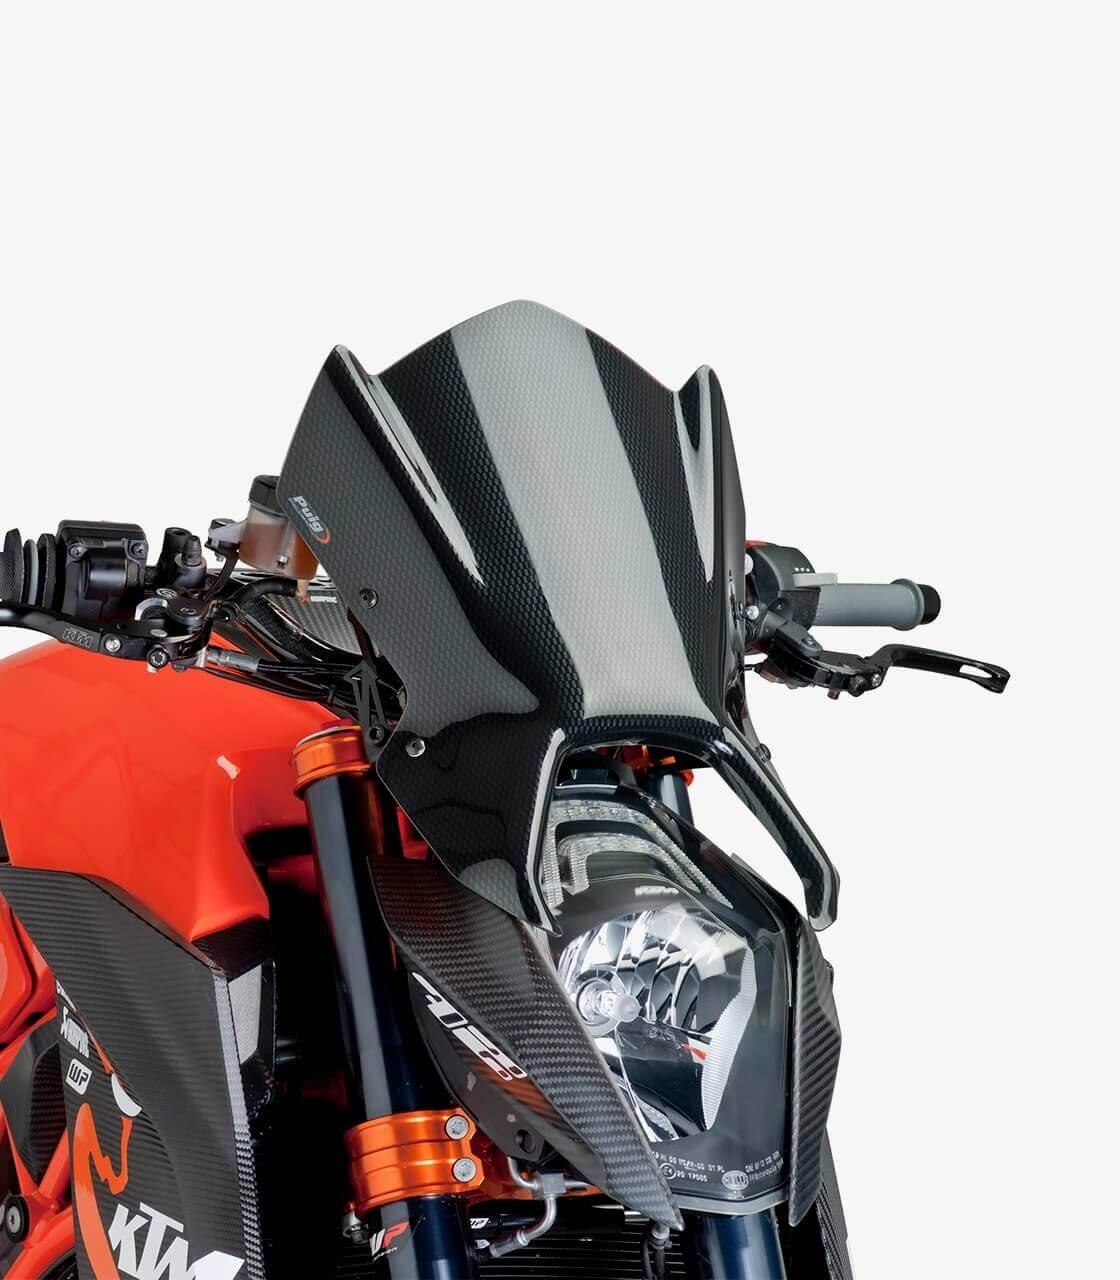 Cúpula Puig KTM 790 Duke Naked New Generation Sport